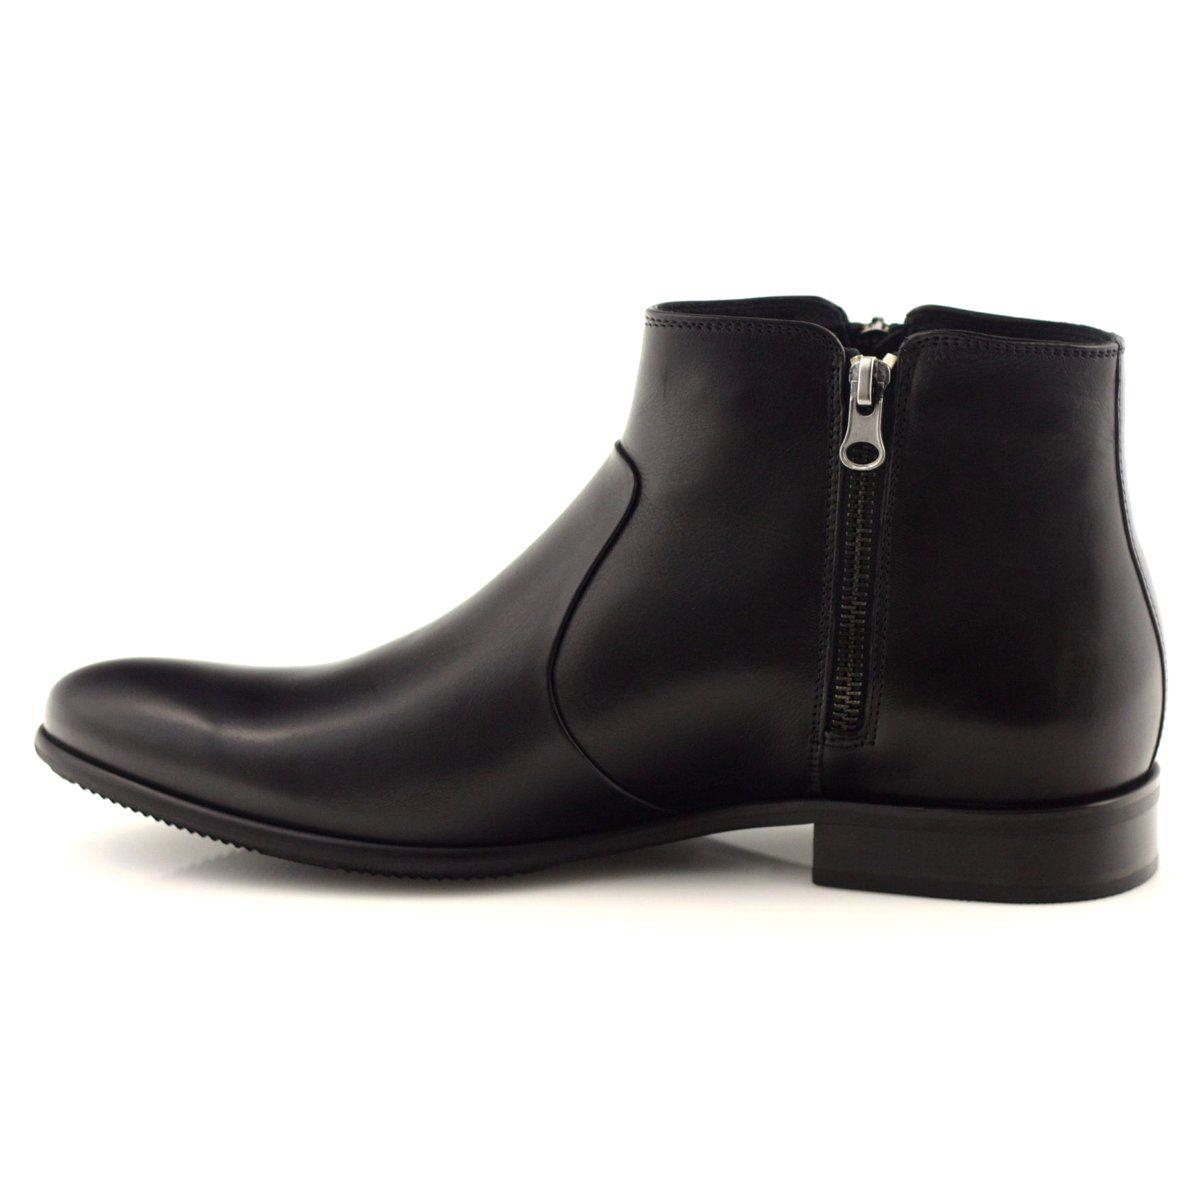 Botki Meskie Zimowe Pilpol 2154 Czarne Calzado Hombre Botines Hombre Hombres